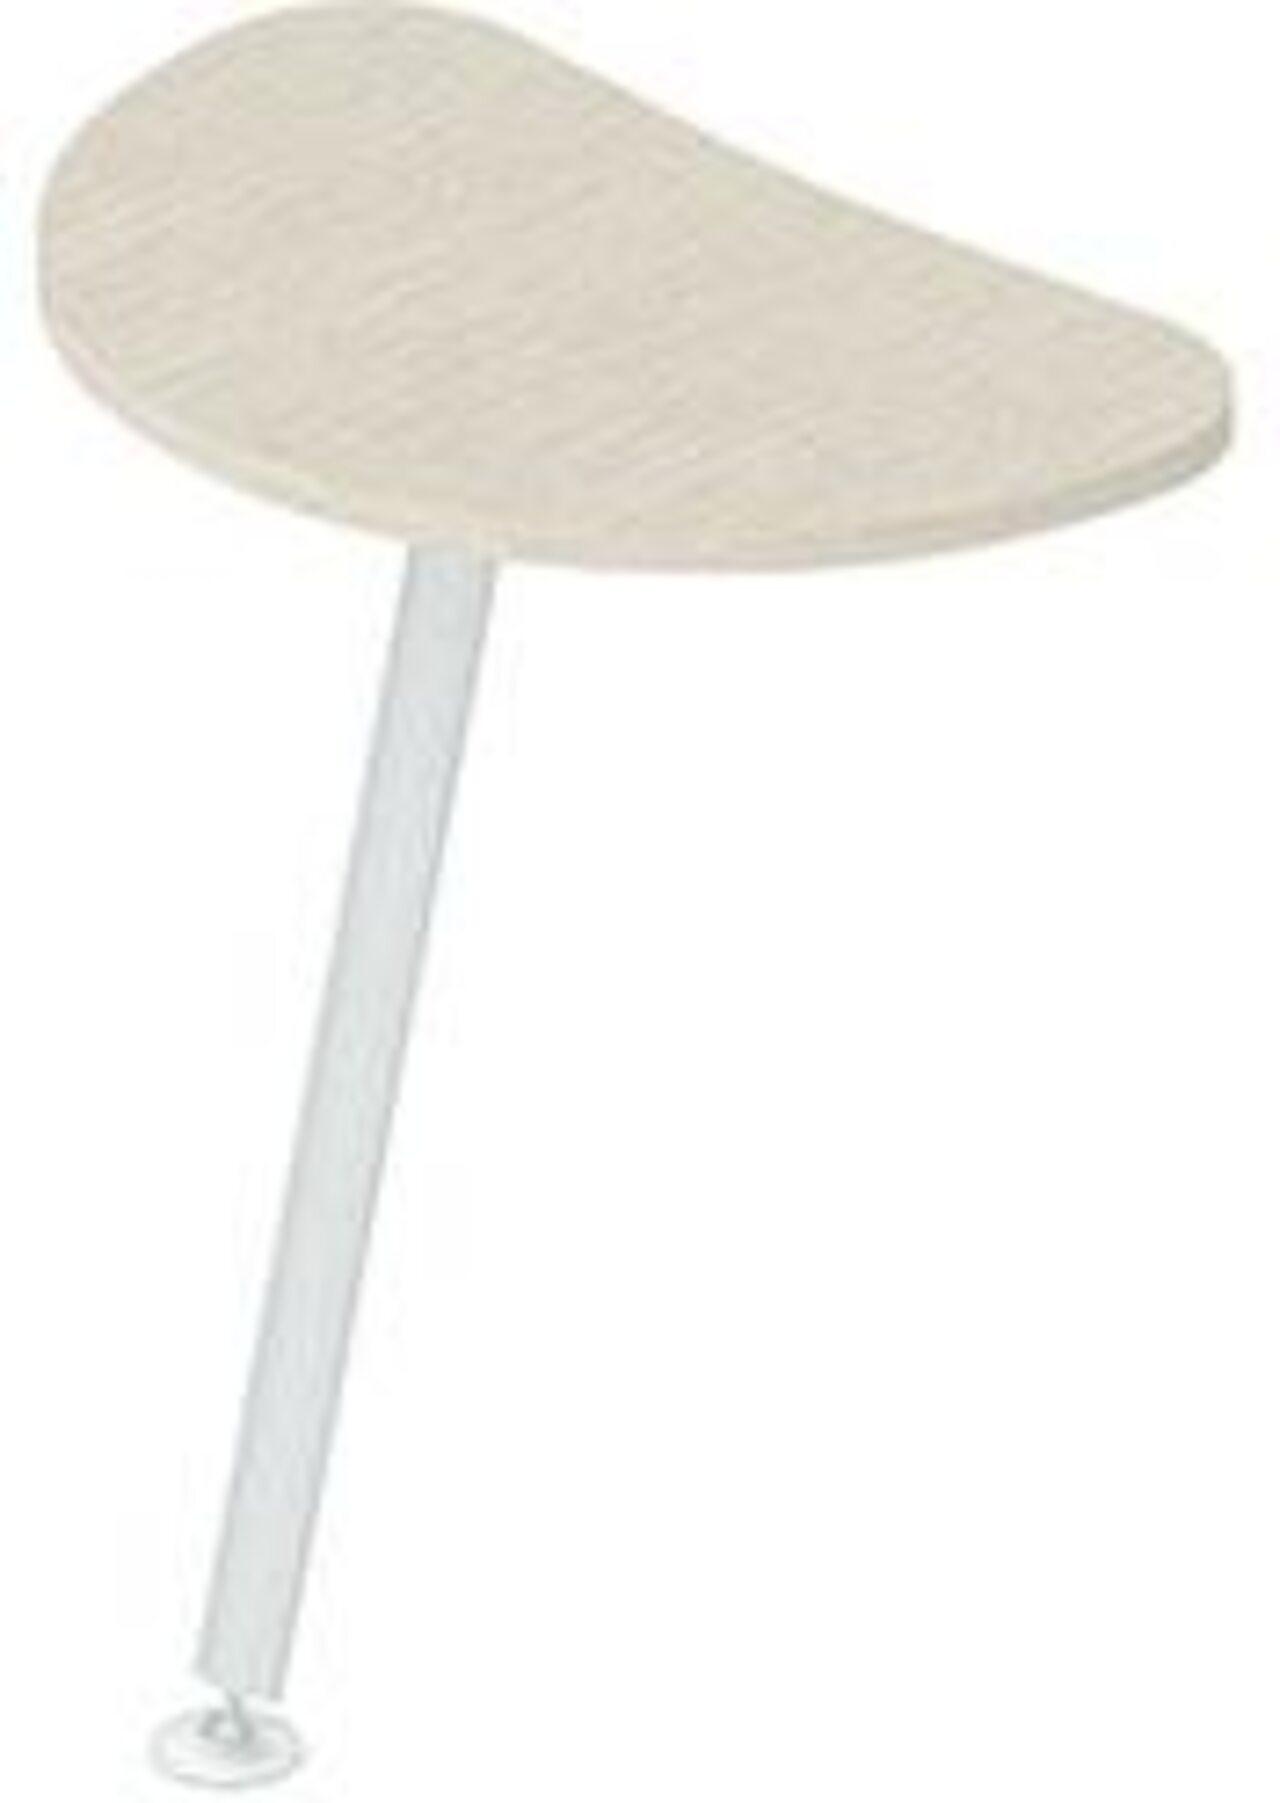 Приставка для криволинейных столов  Gamma (Гамма) 44x69x3 - фото 3